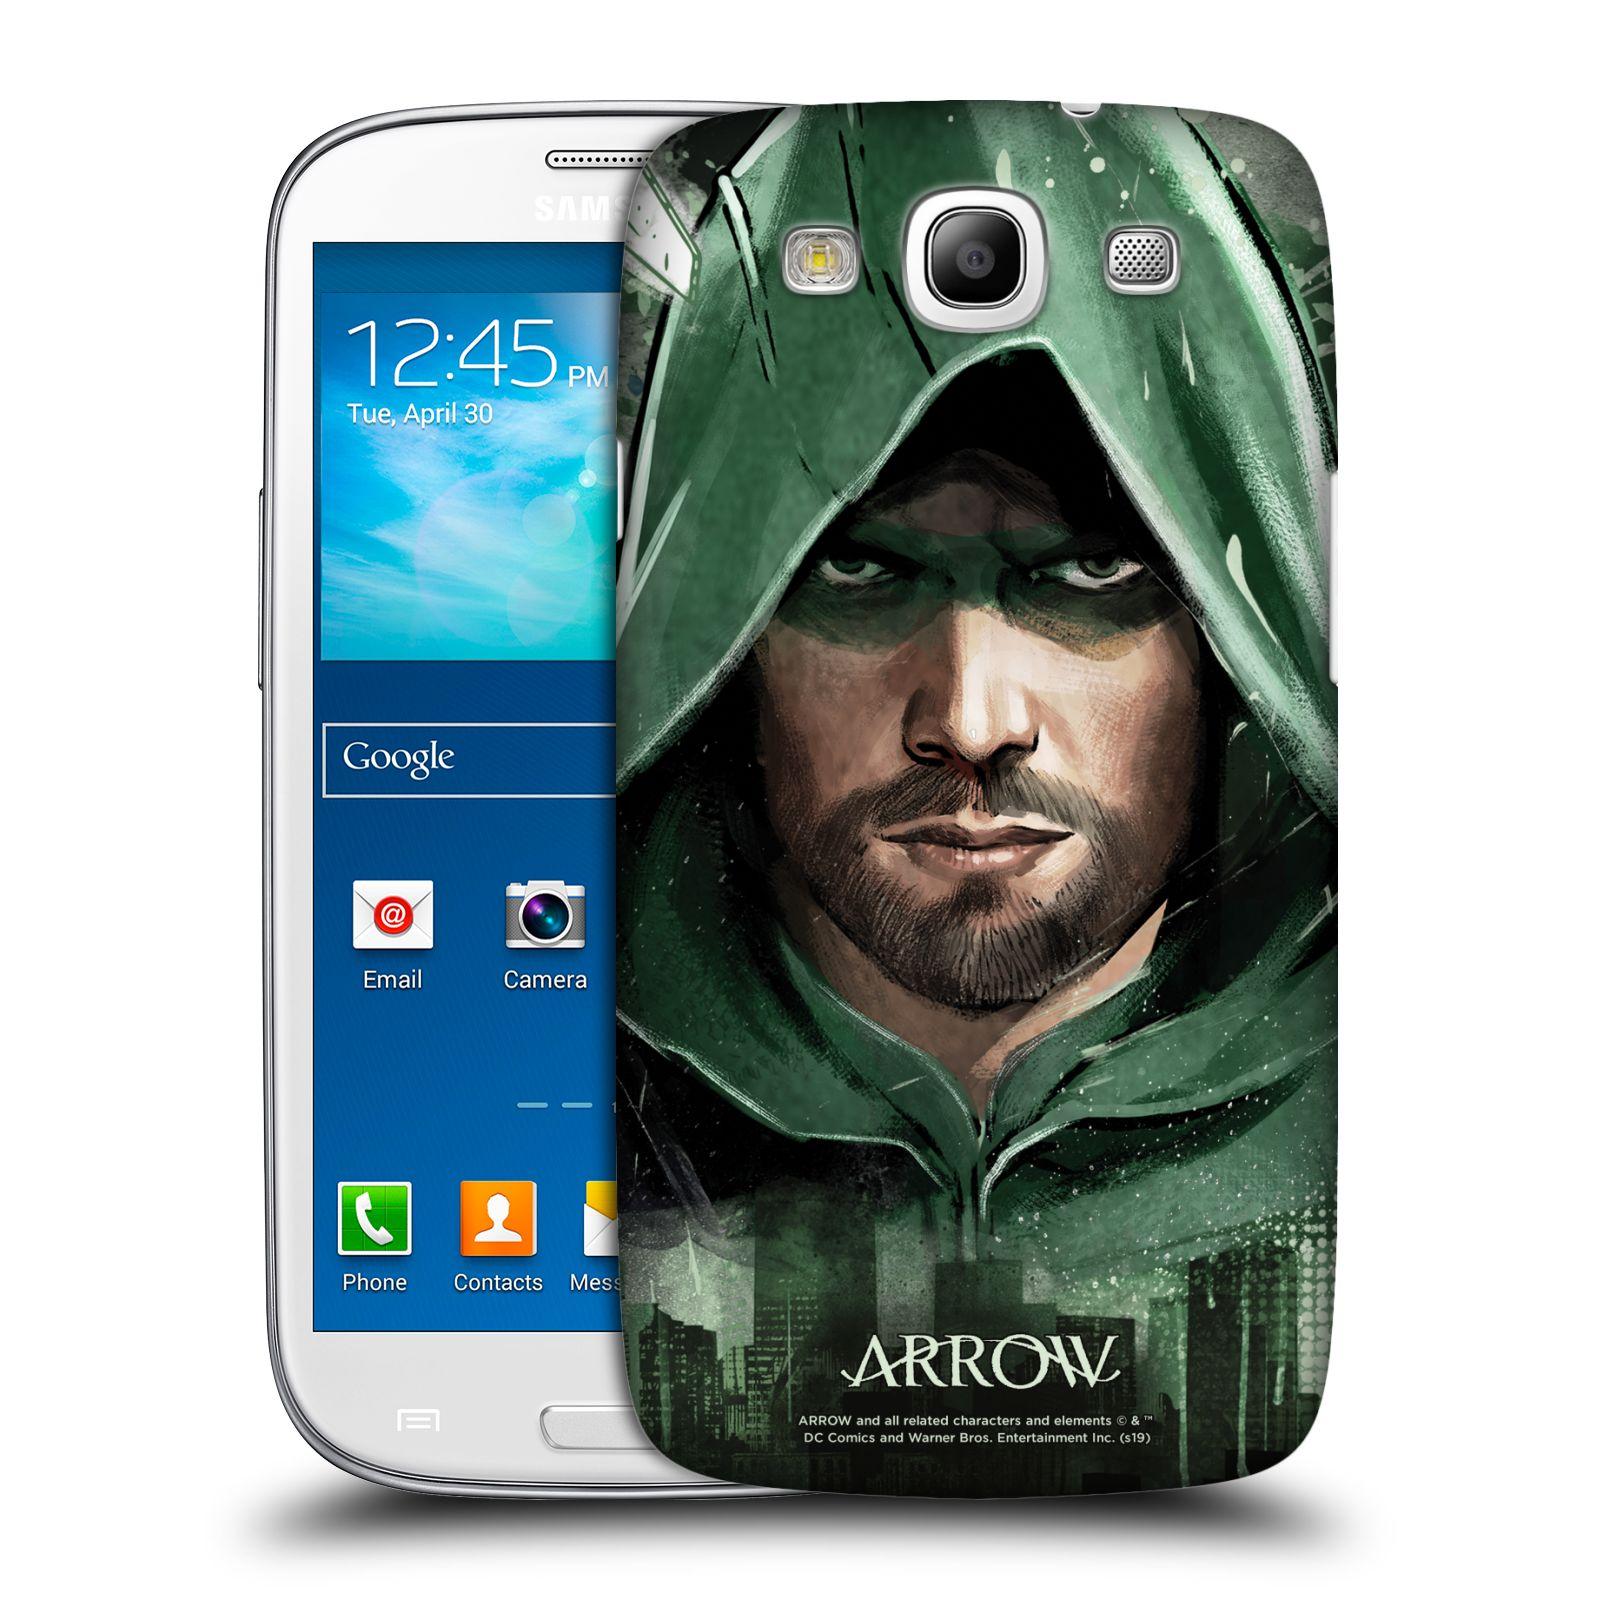 Pouzdro na mobil Samsung Galaxy S3 - HEAD CASE - Seriál Arrow - kreslený motiv